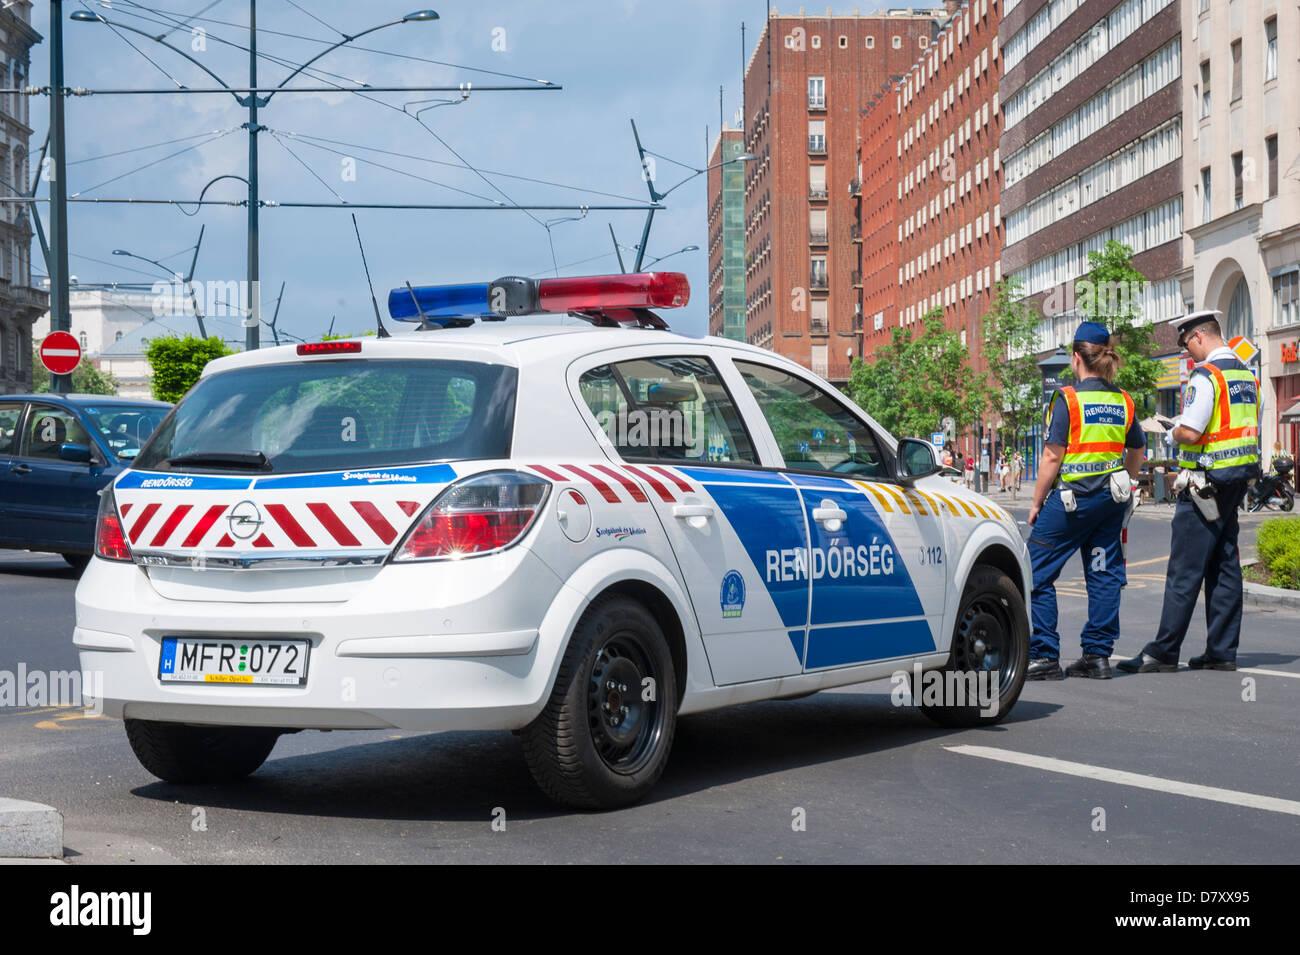 Budapest Hungary Great Synagogue Zsinagoga Rendorseg police car man woman guard guards sentry sentries road block - Stock Image